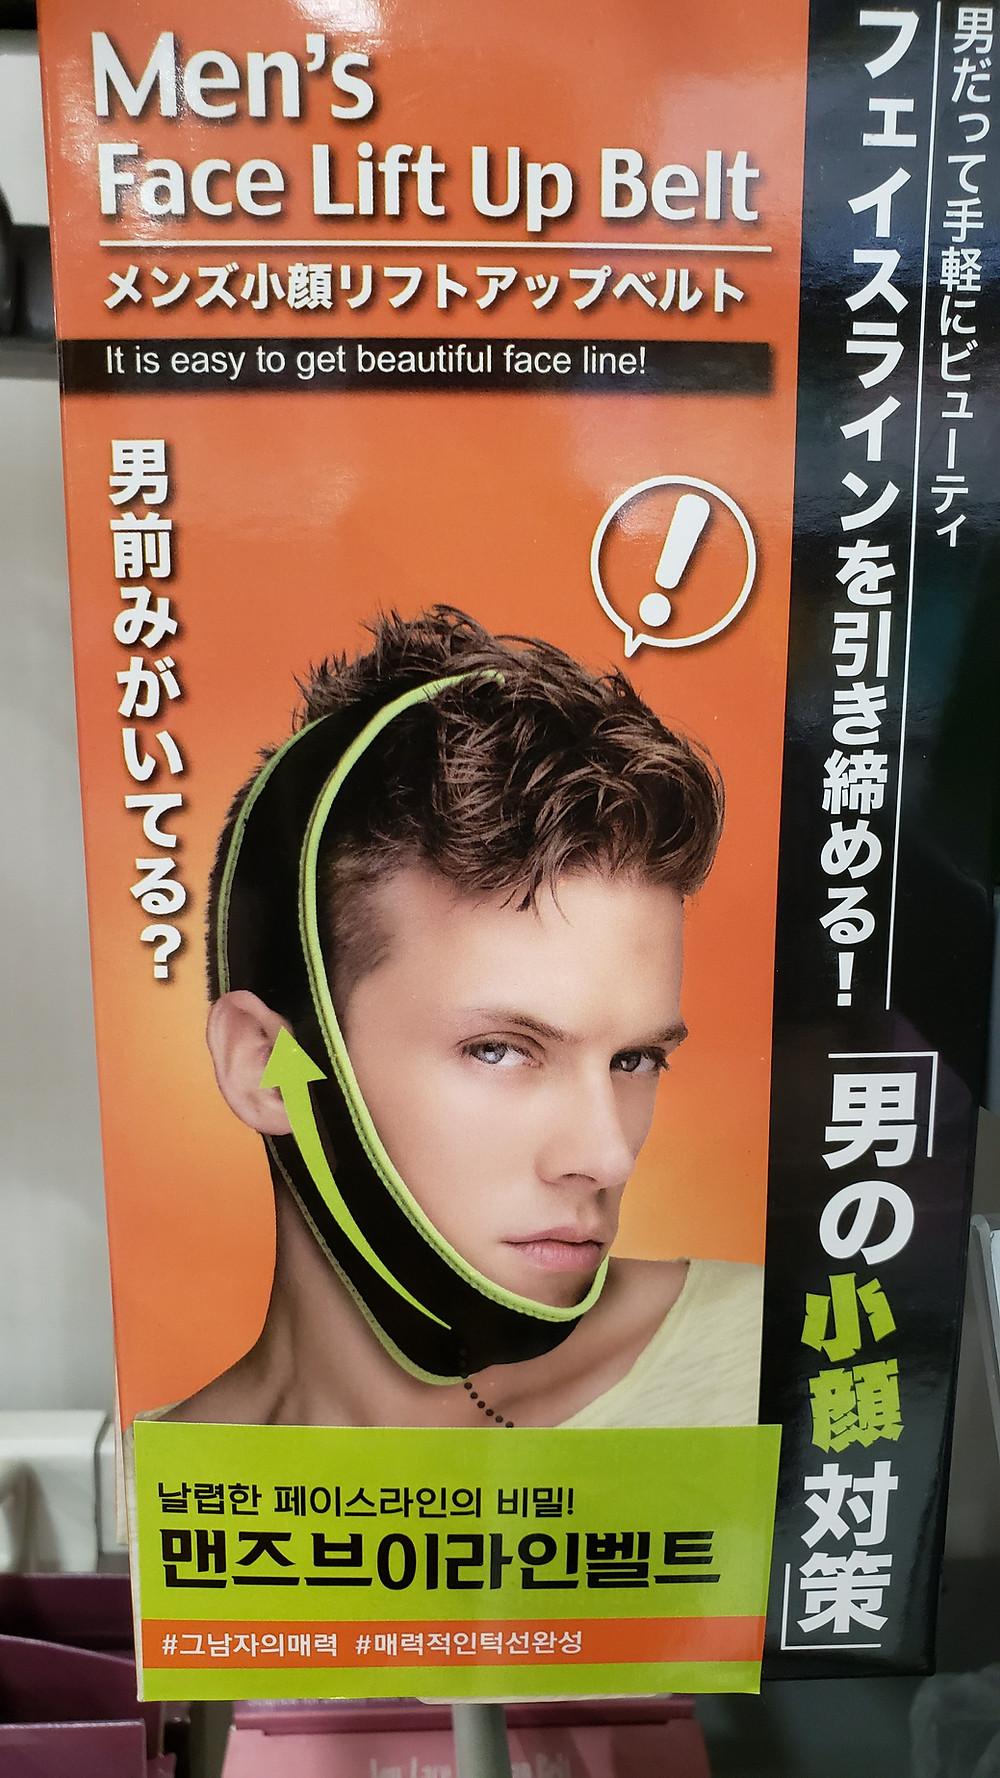 Japanese Men's Face Lift Up Belt